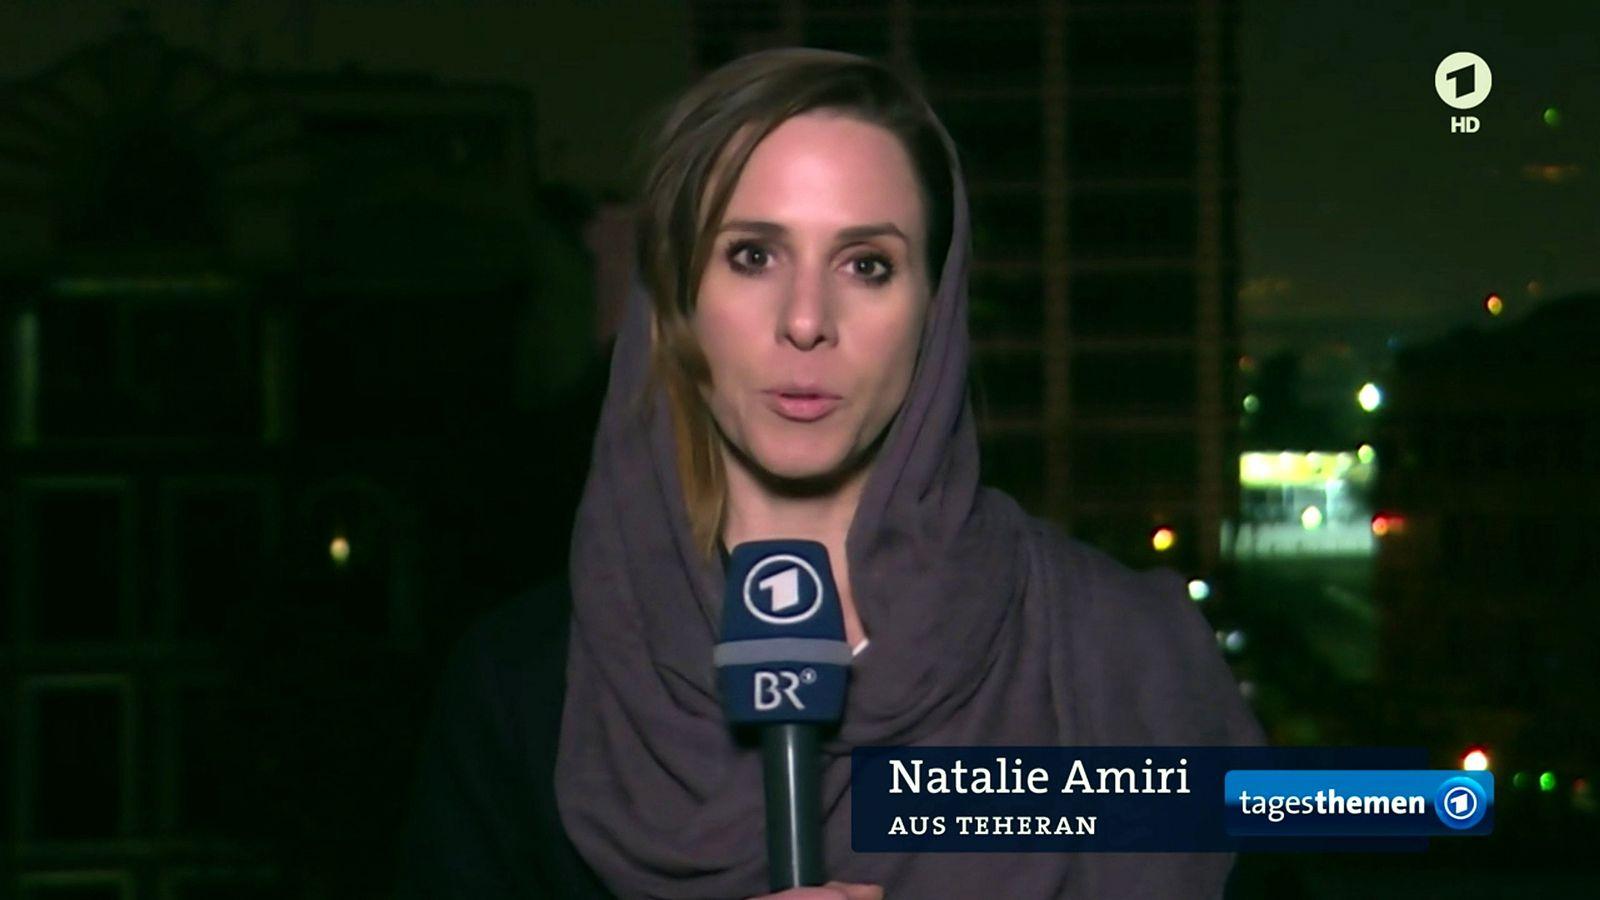 EINMALIGE VERWENDUNG Natalie Amiri SCREENSHOT